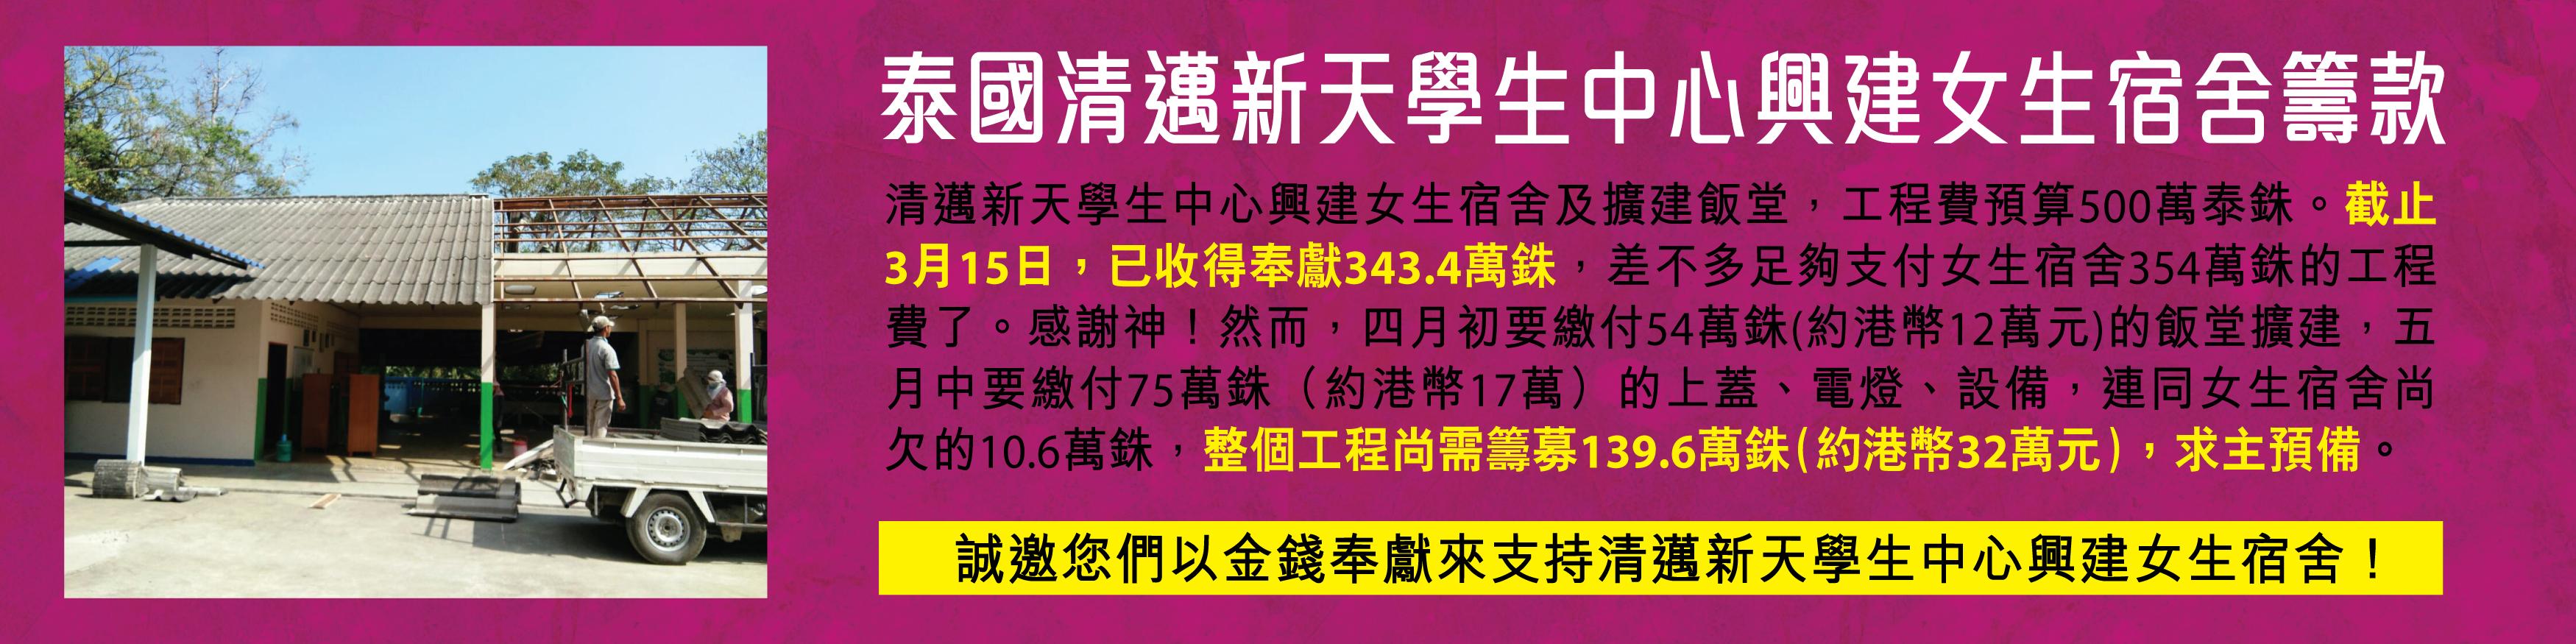 CB-02-web-banner-1680-x-420-018